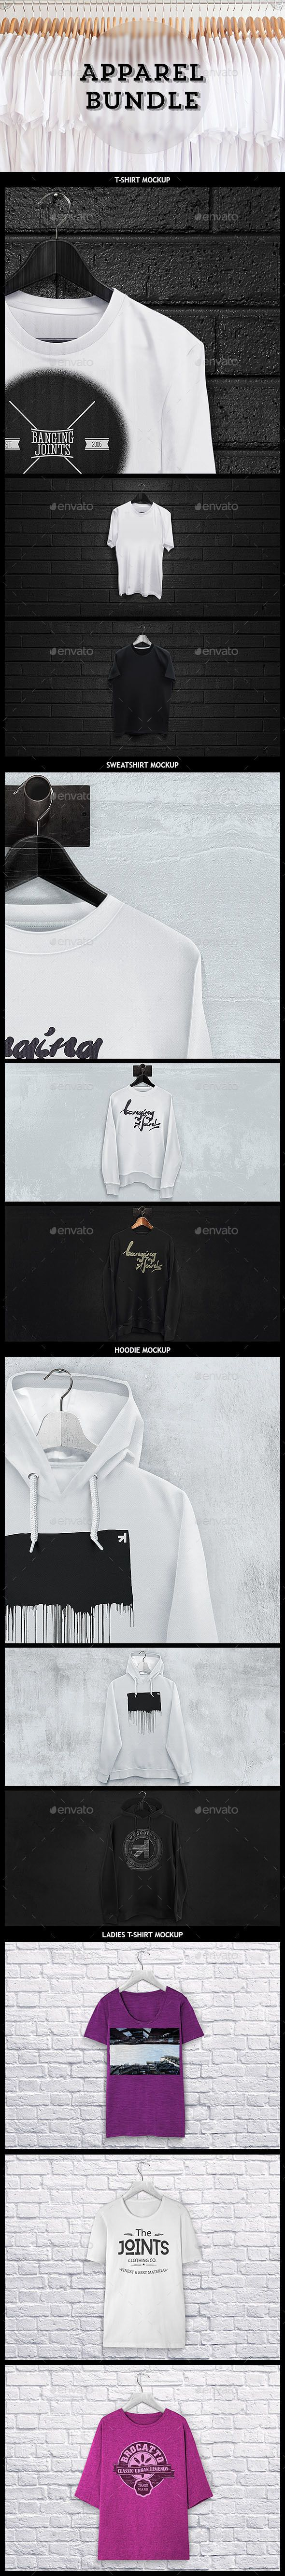 Download Apparel Mockup Bundle T Shirt Sweat Hoodie Clothing Mockup Sweat Hoodie Hoodie Mockup